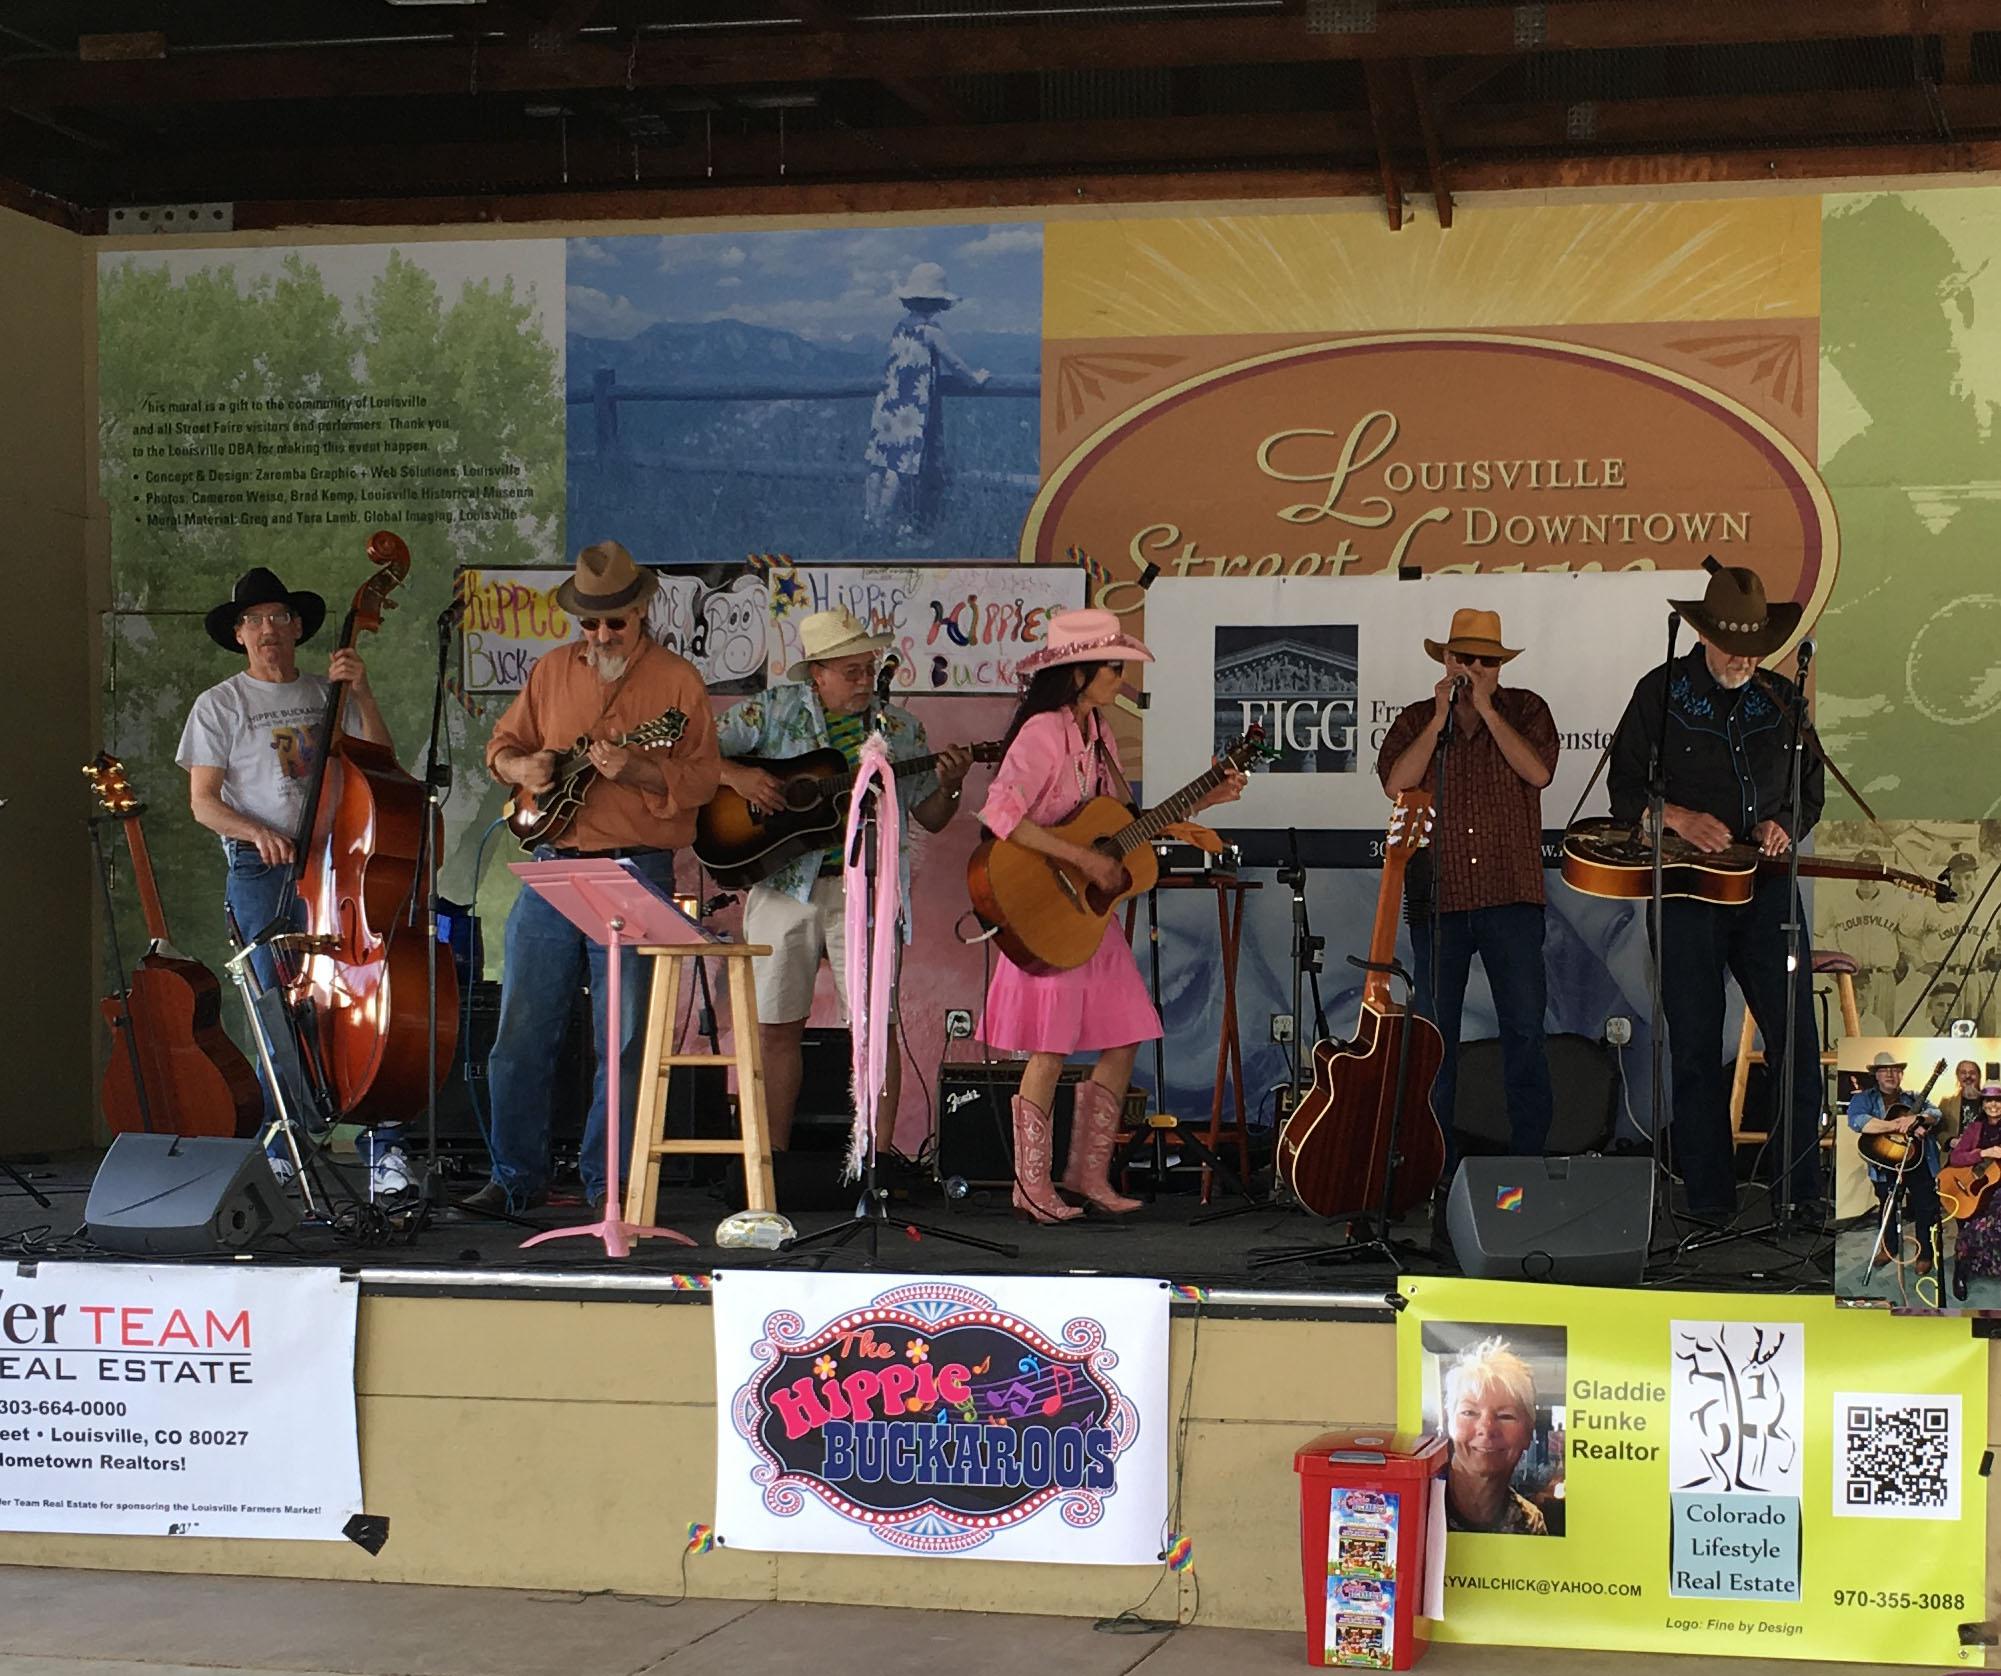 Barbara Jo & The Hippie Buckaroos perform at the Louisville Farmers Market, May 2016.